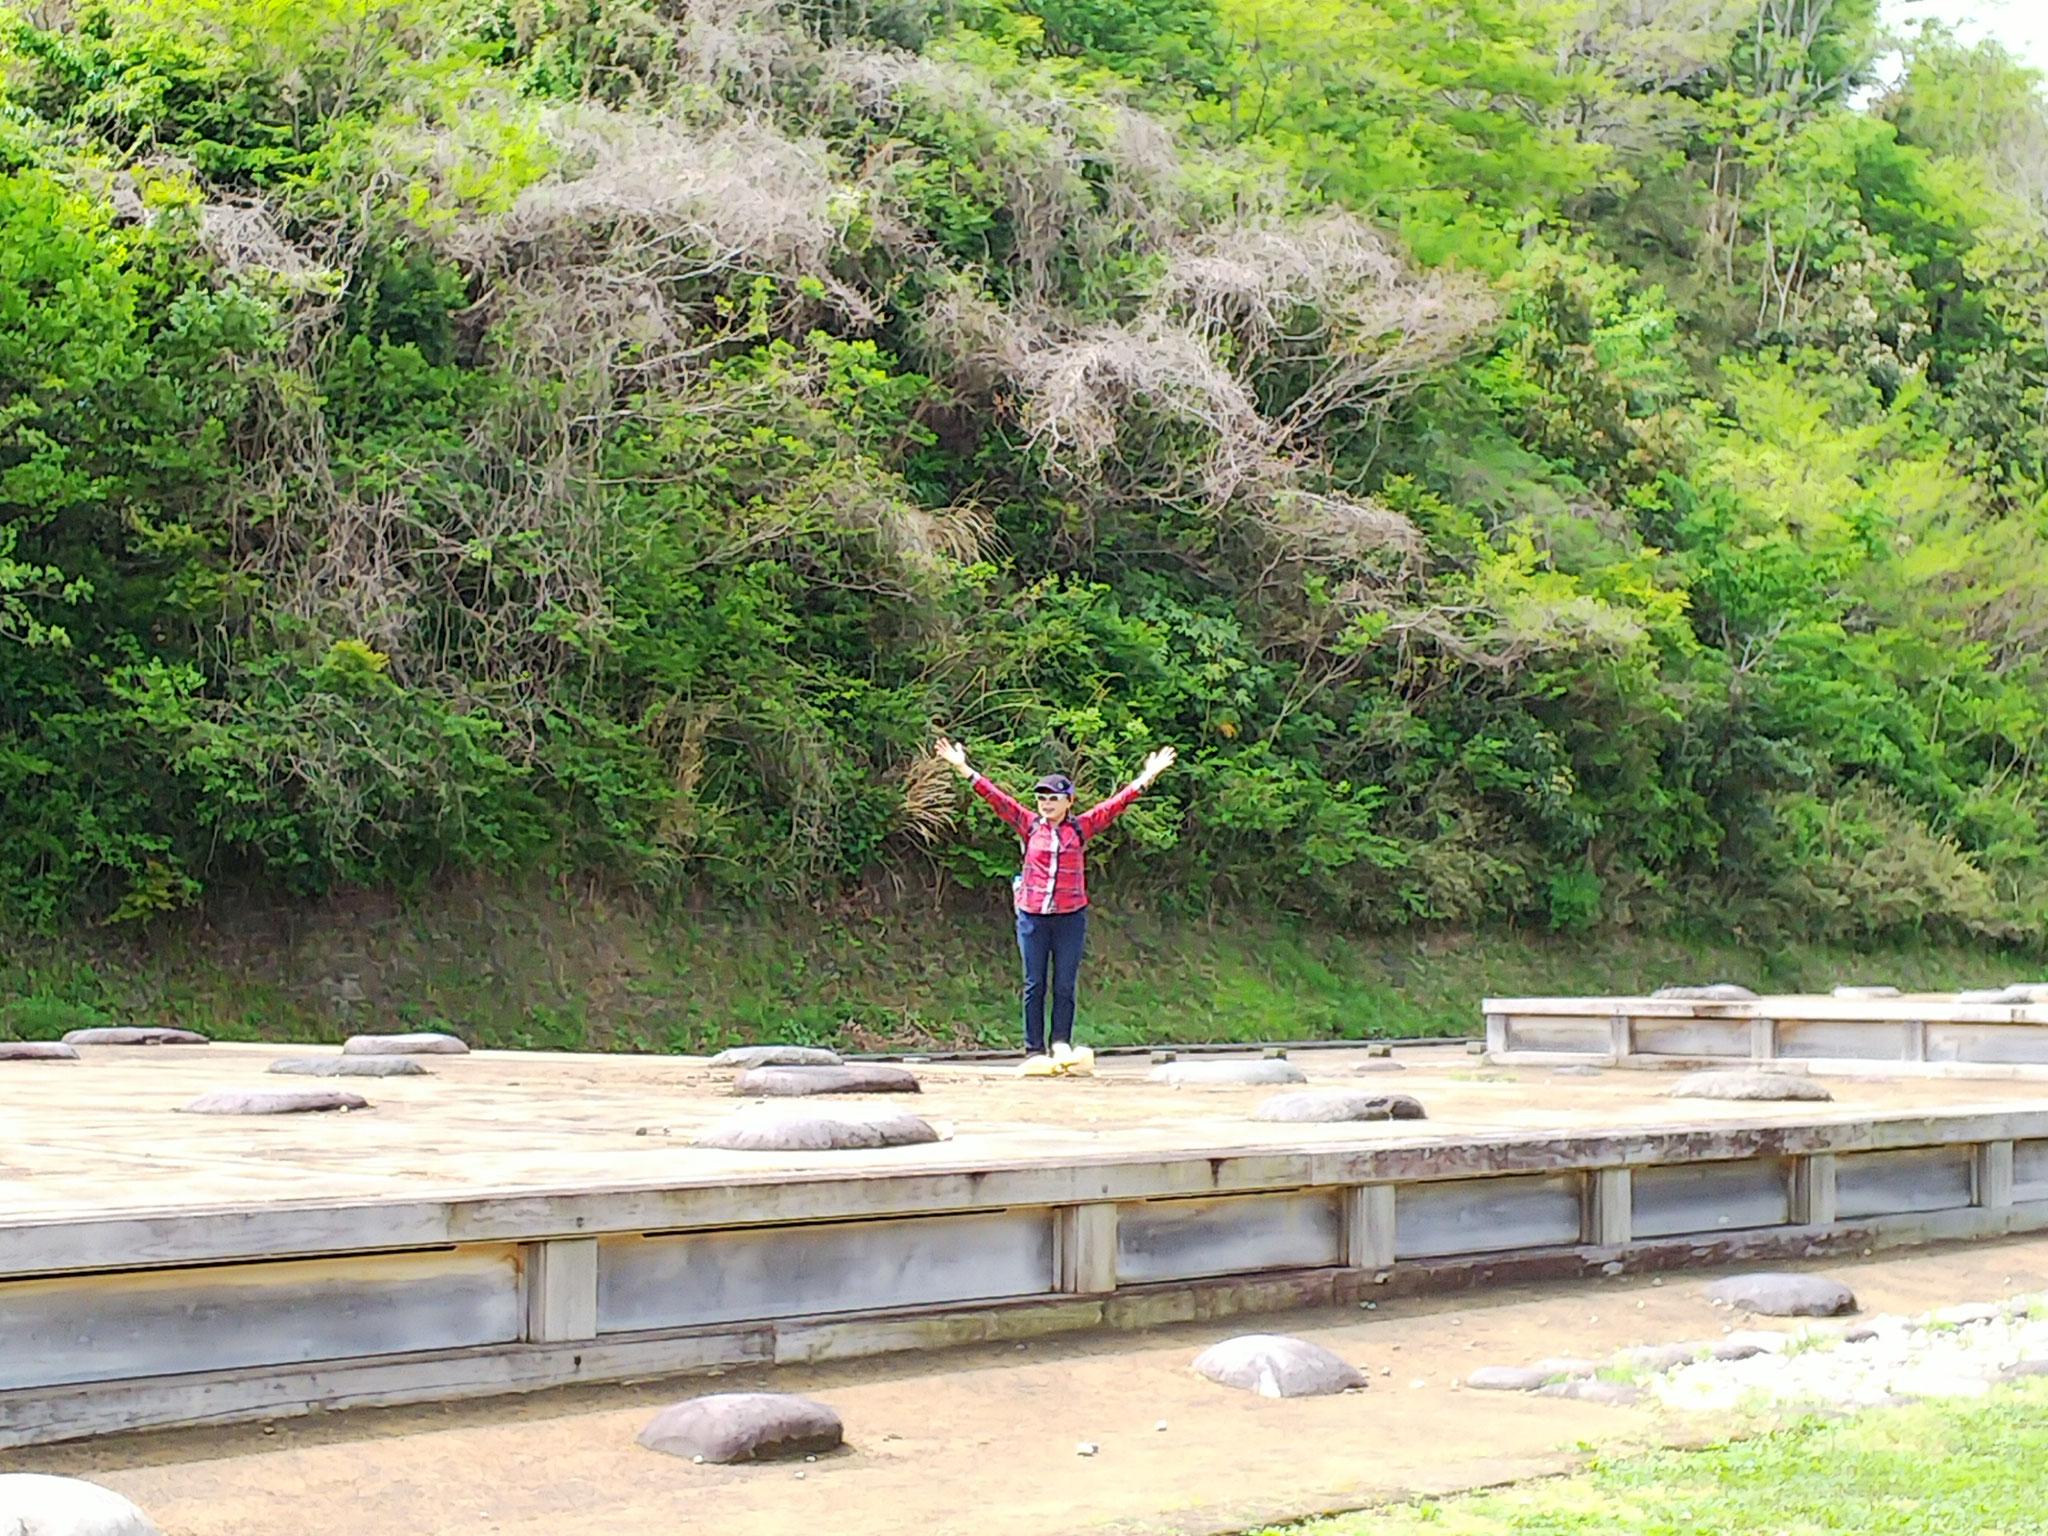 永福寺本堂二階堂の礎石跡